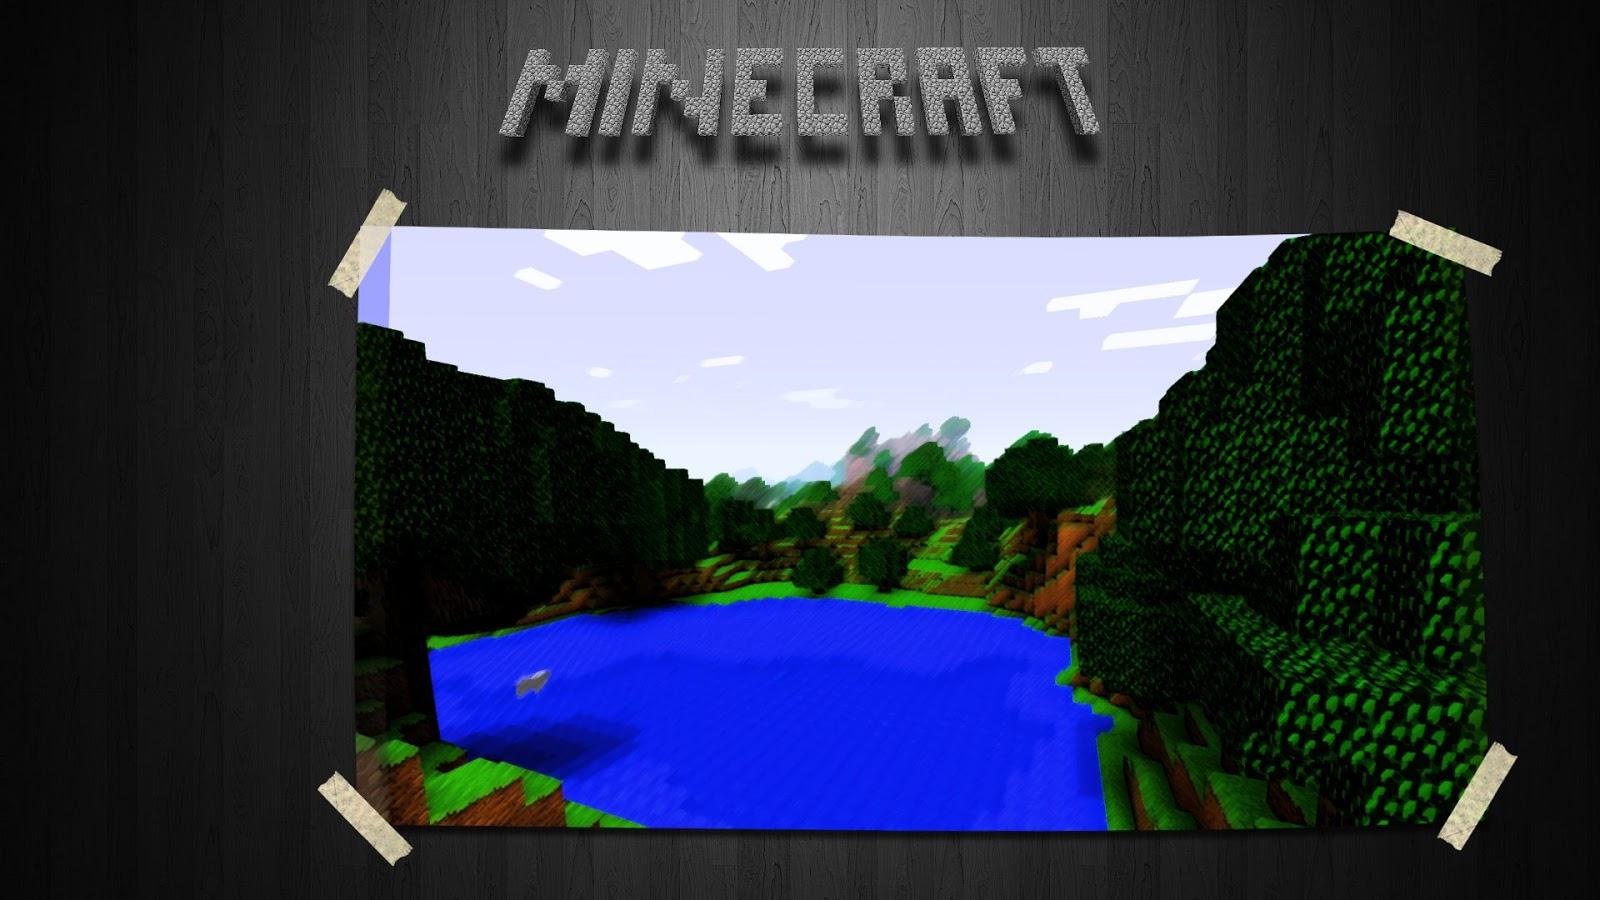 Cool Minecraft WallpapersHD Minecraft WallpapersMinecraft Wallpaper 1600x900